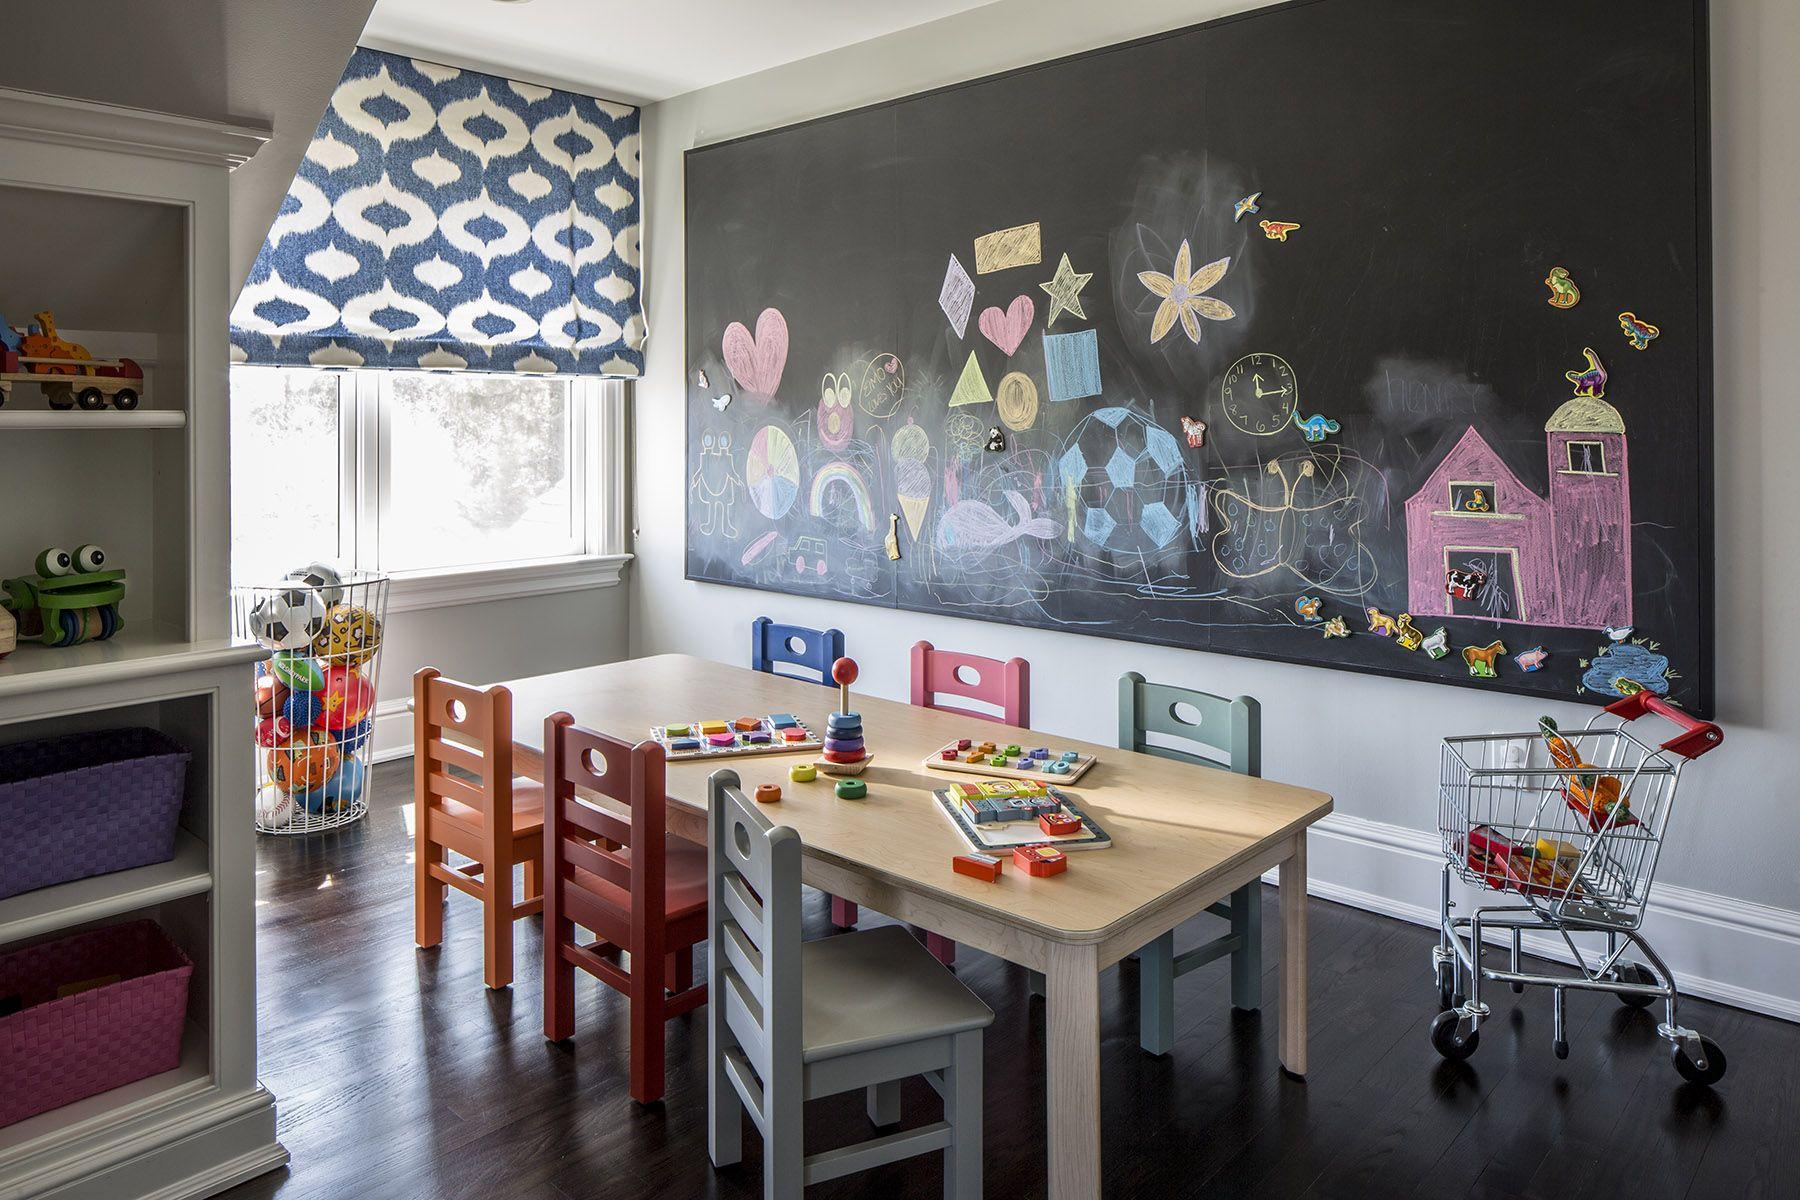 Pin By Anna Tausend On Kid Spaces Interior Design School Home Decor Best Interior Design